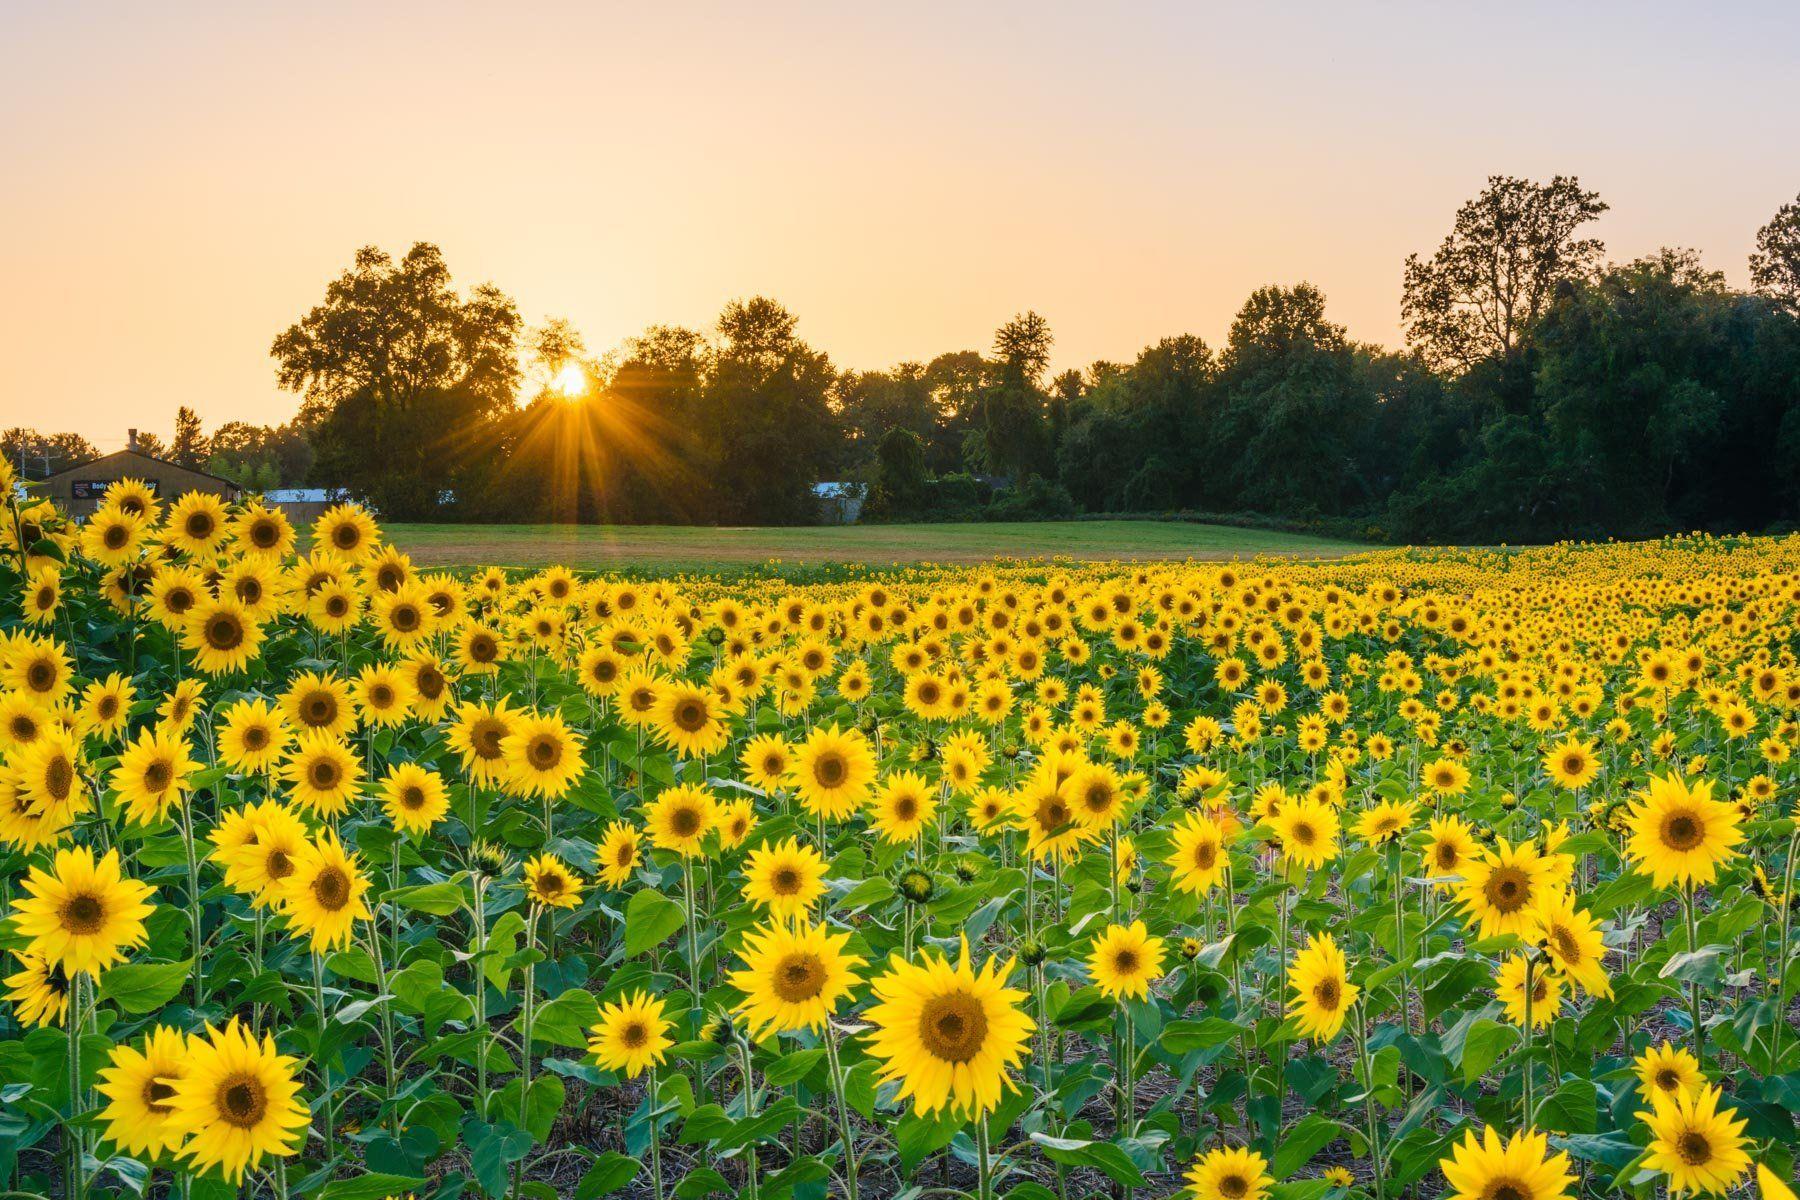 Sunflower field at sunset in Jarrettsville, Maryland. Photo Print on ...